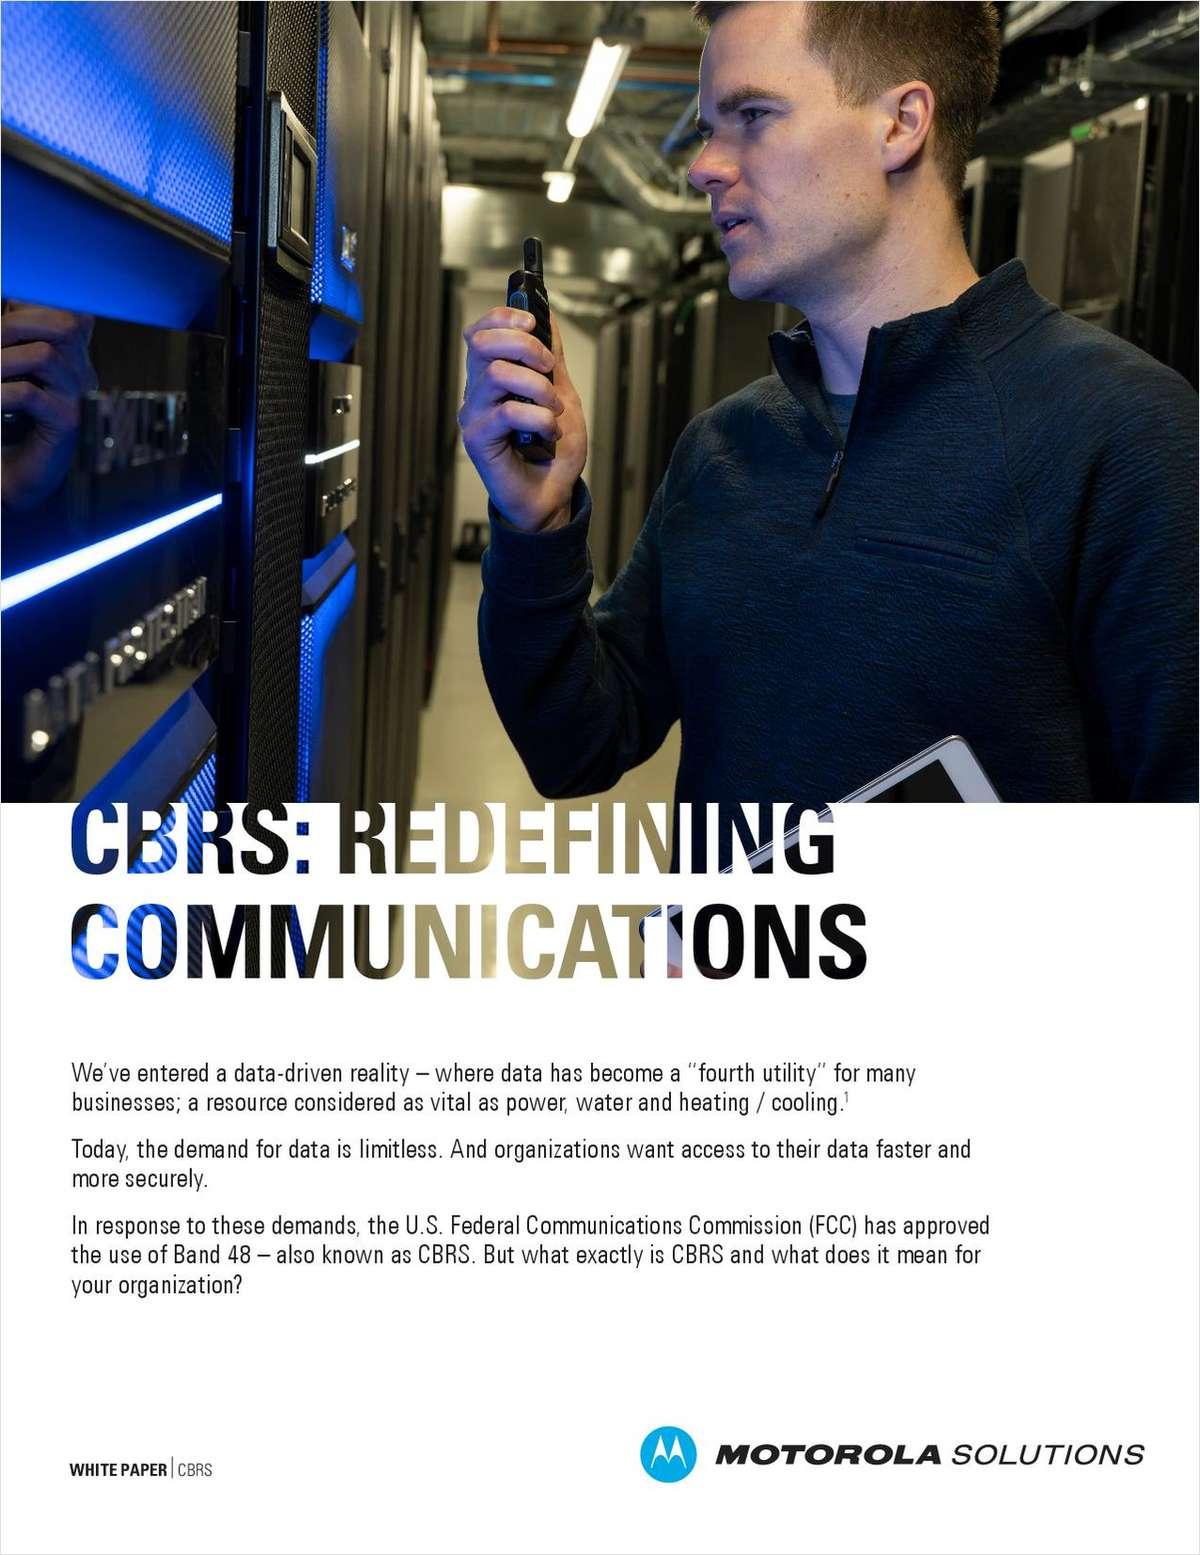 CBRS: Redefining Communications